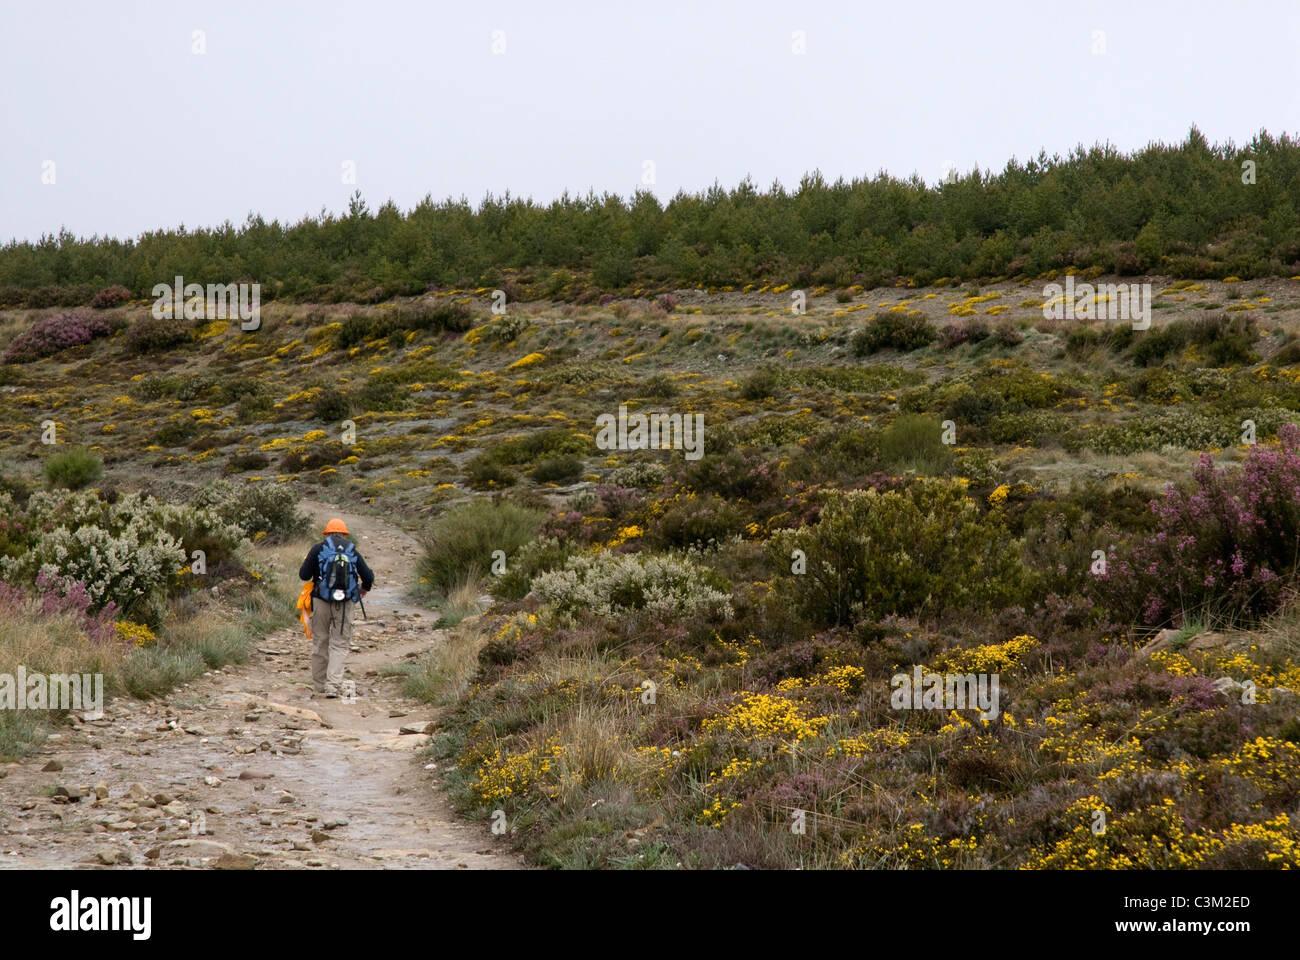 Hillwalker, Camino de Santiago, Northern Spain - Stock Image